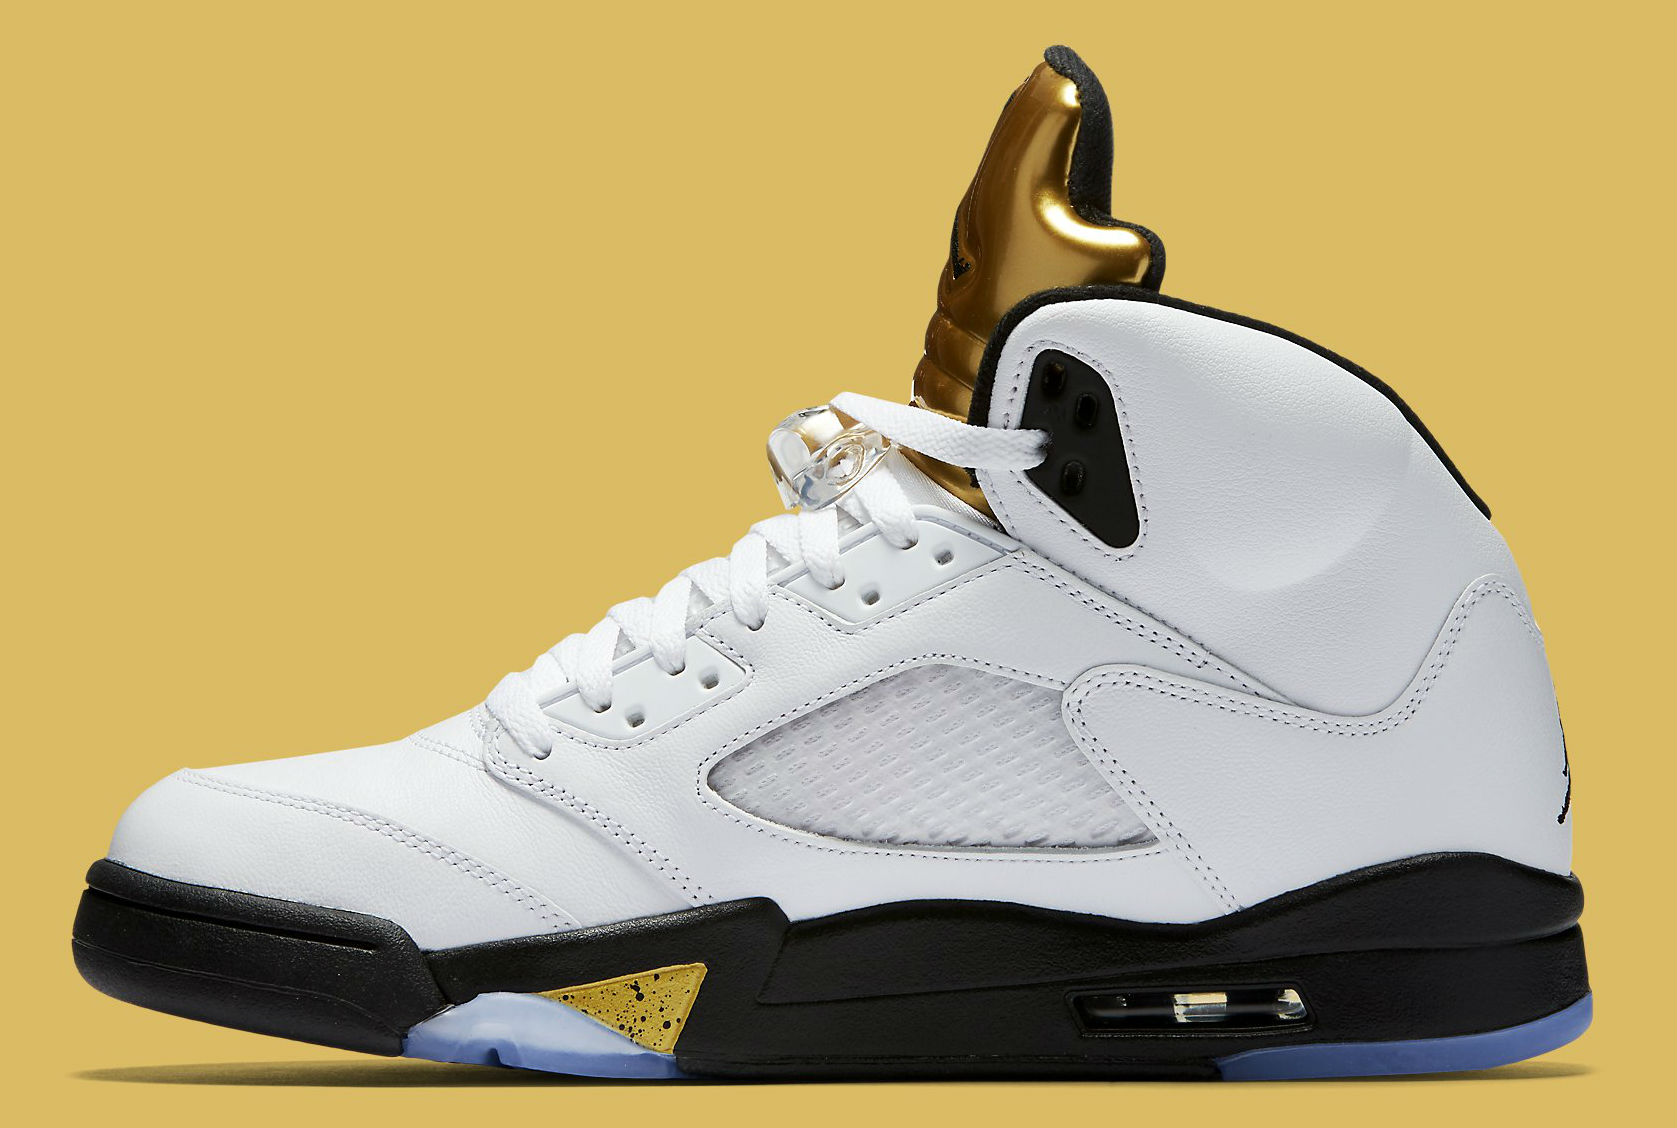 newest e5e7a c2307 Gold Jordan 5 Release Date 136027-133 | Sole Collector